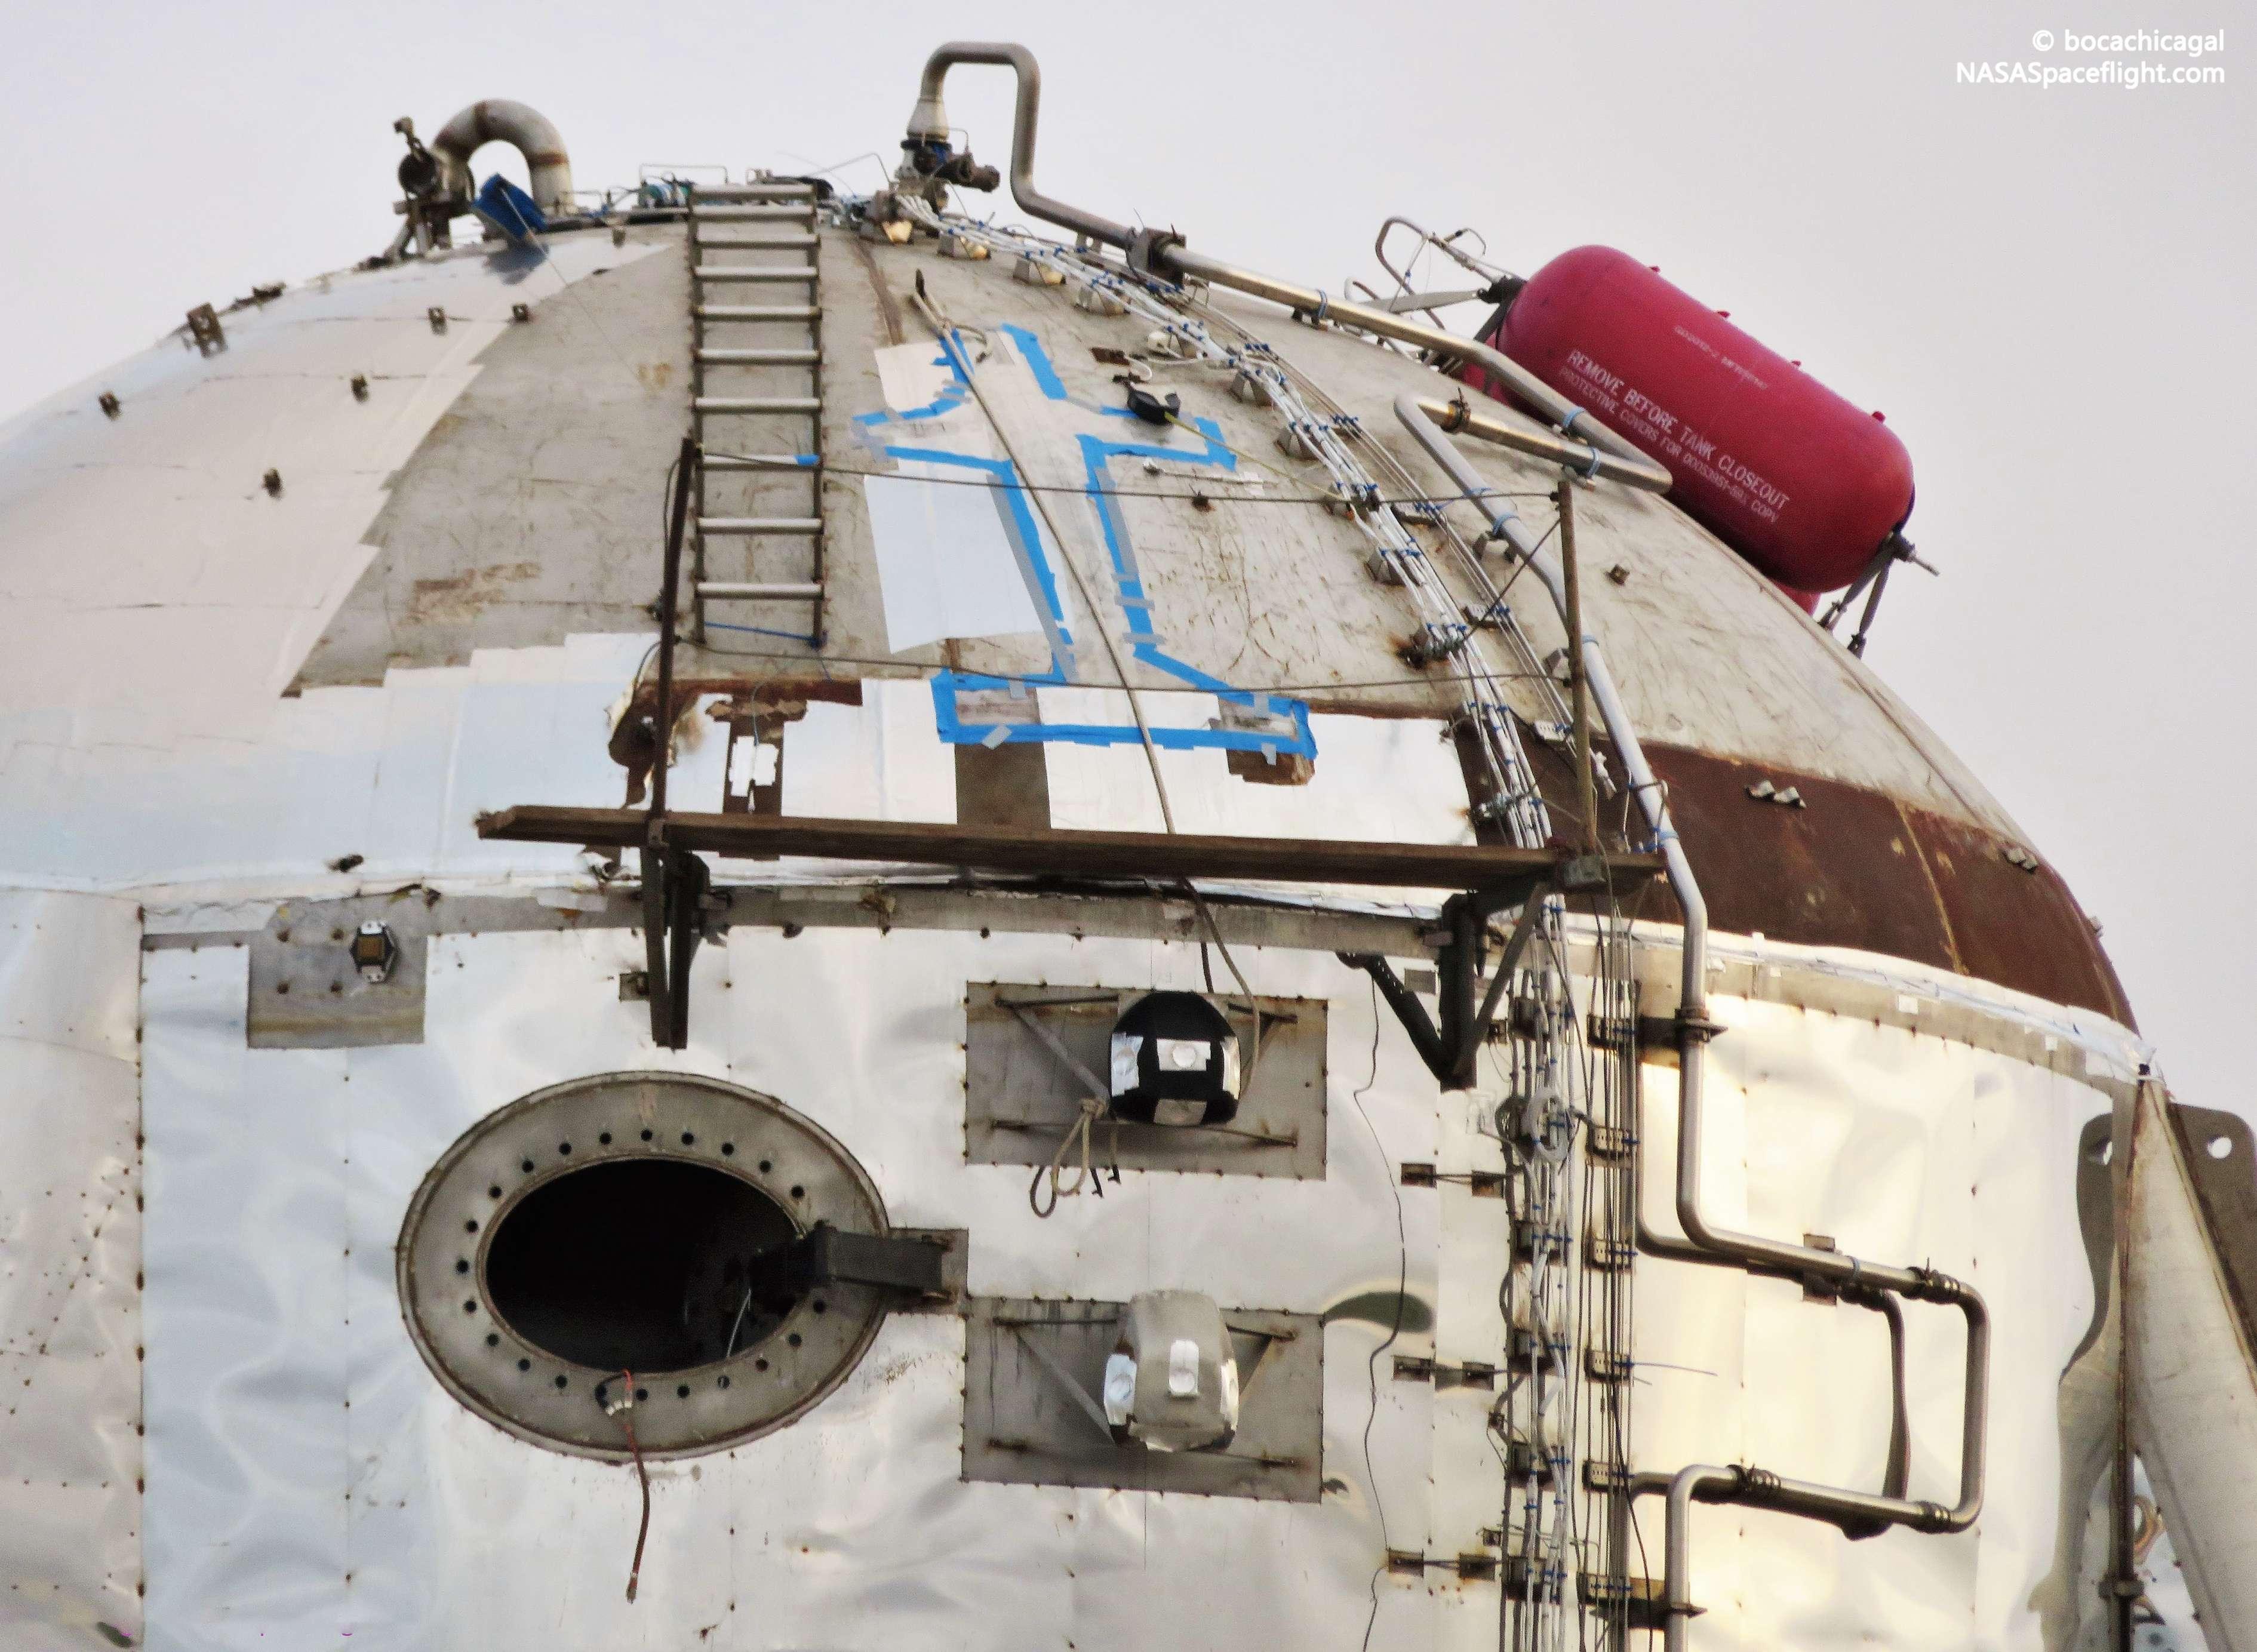 Boca Chica Starhopper ACS install 050719 (NASASpaceflight – bocachicagal) 4 (c)